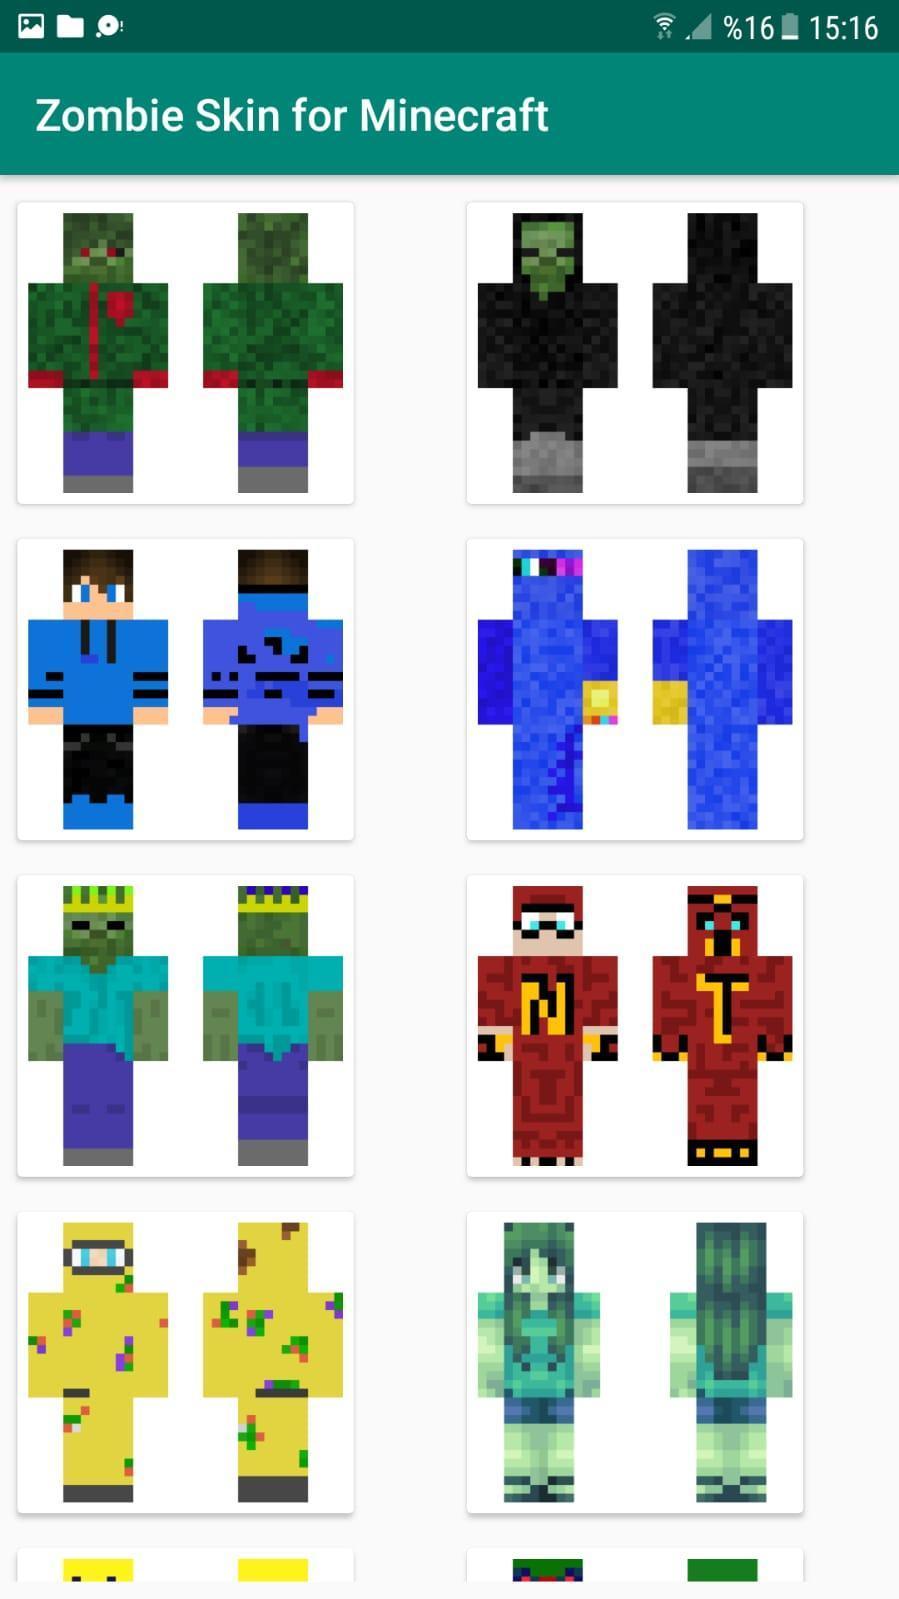 Zombie Skin for Minecraft para Android - APK Baixar